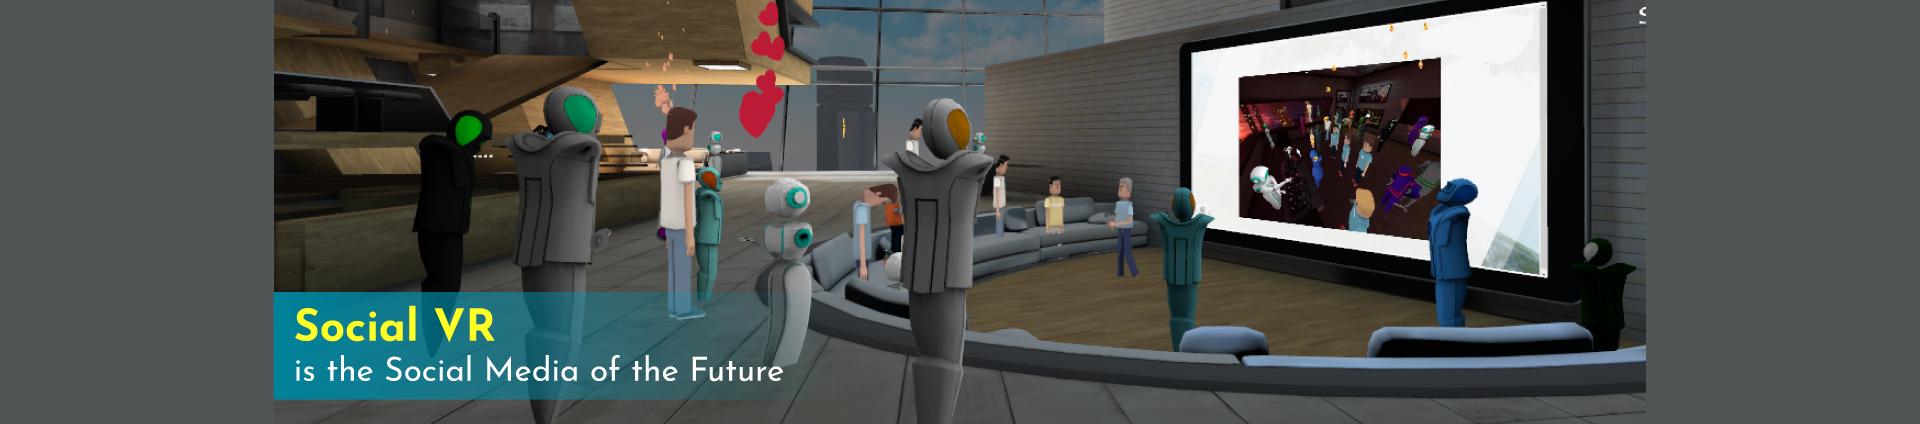 People having fun in Social VR Application